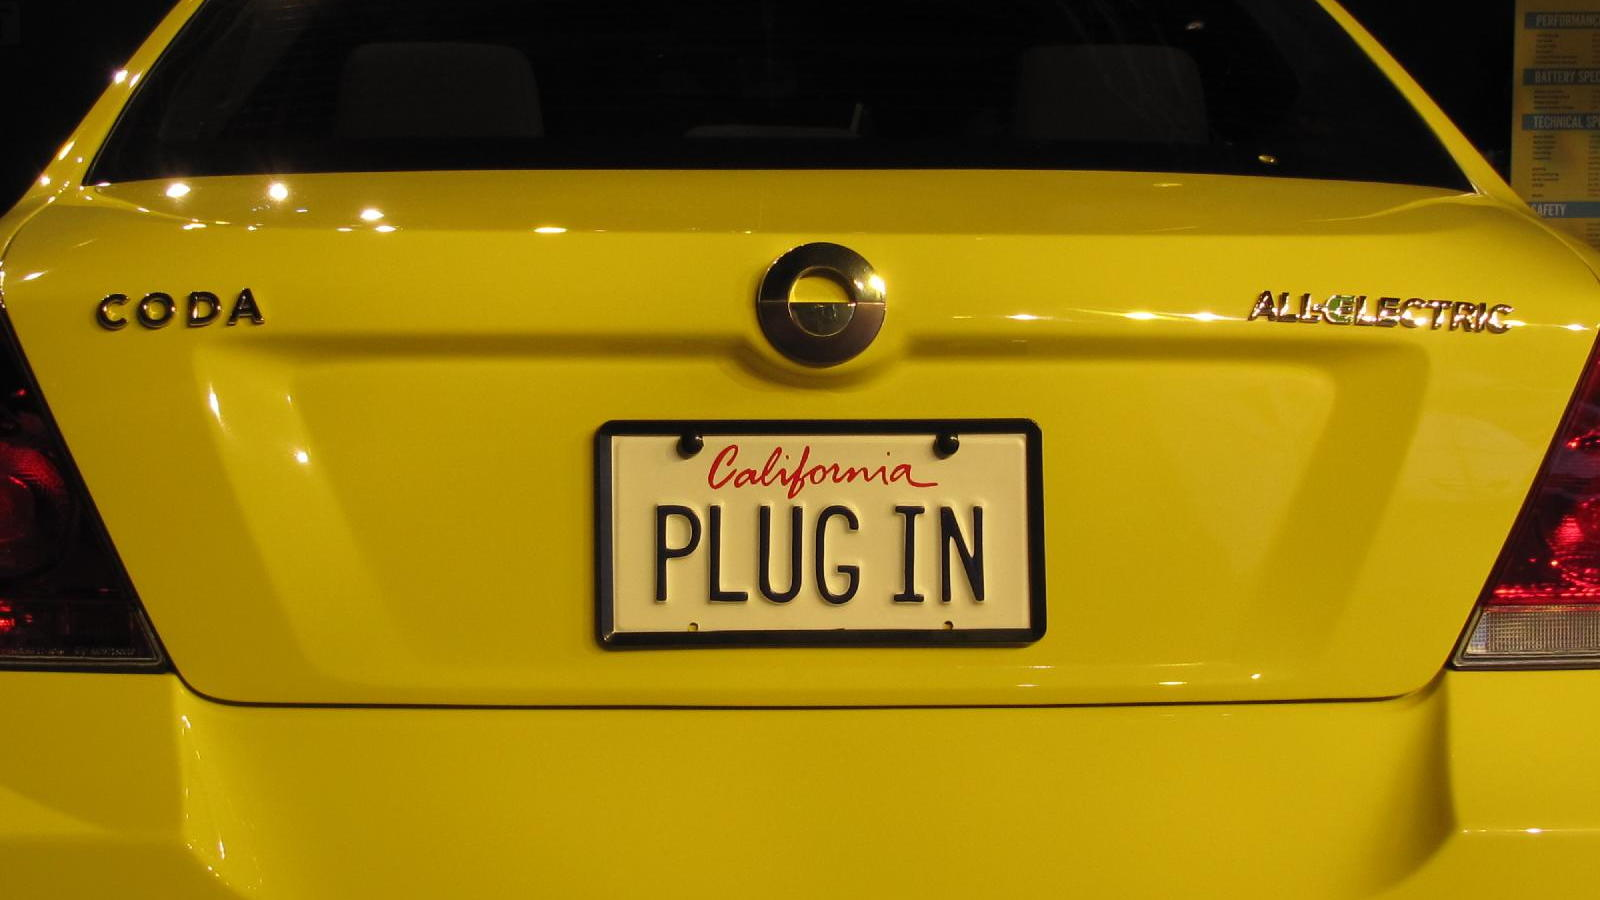 2011 Coda Sedan electric car, 'Plug In' license plate, 2010 Los Angeles Auto Show